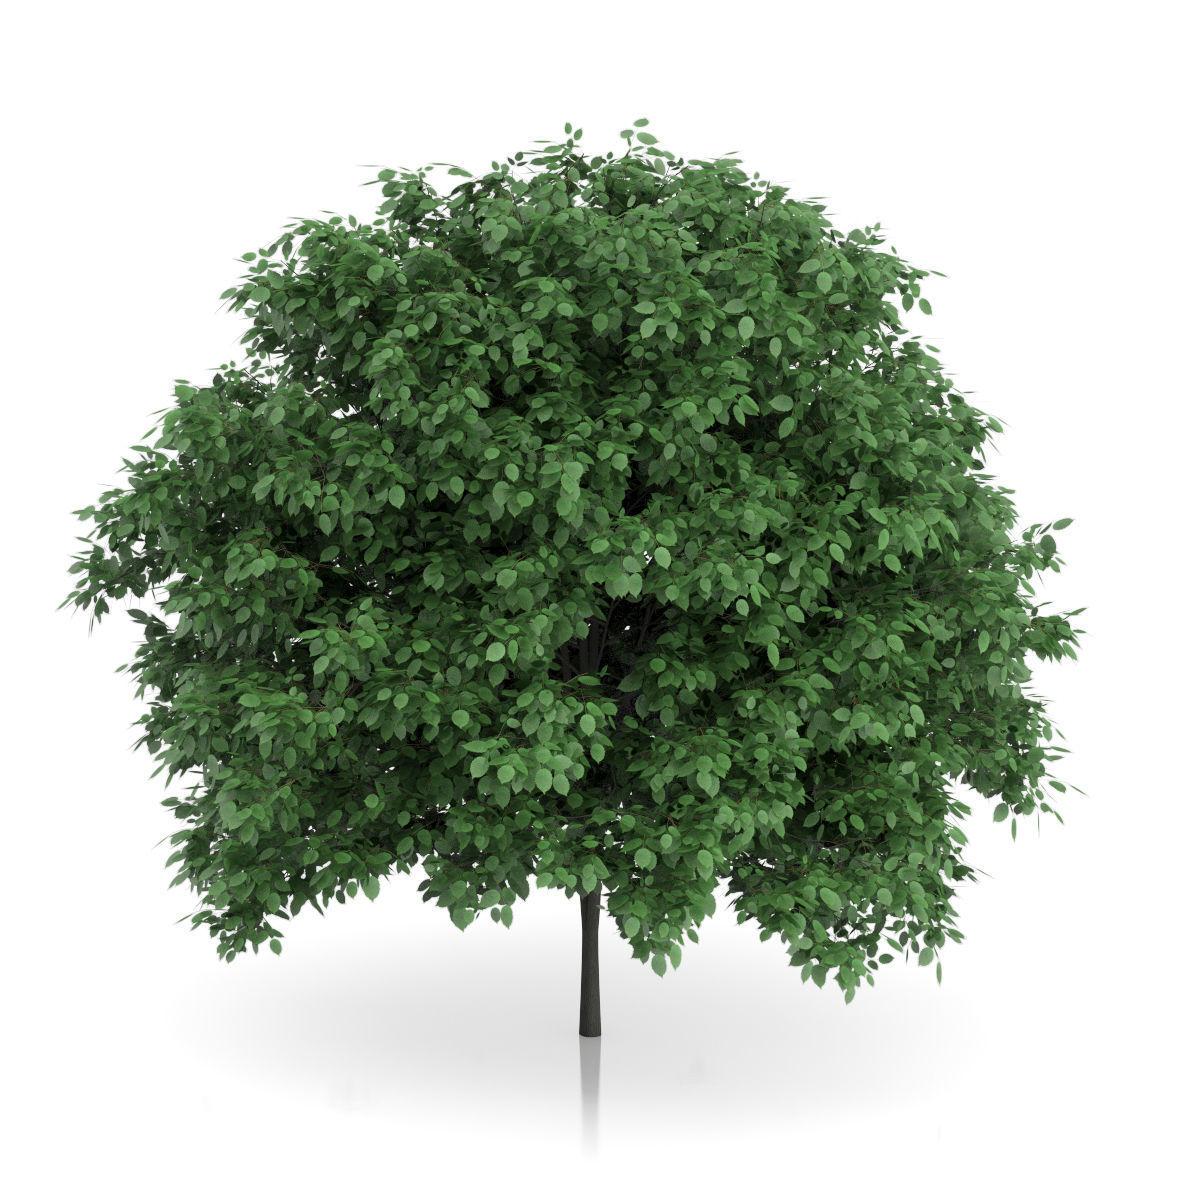 Common Hornbeam Tree Carpinus betulus